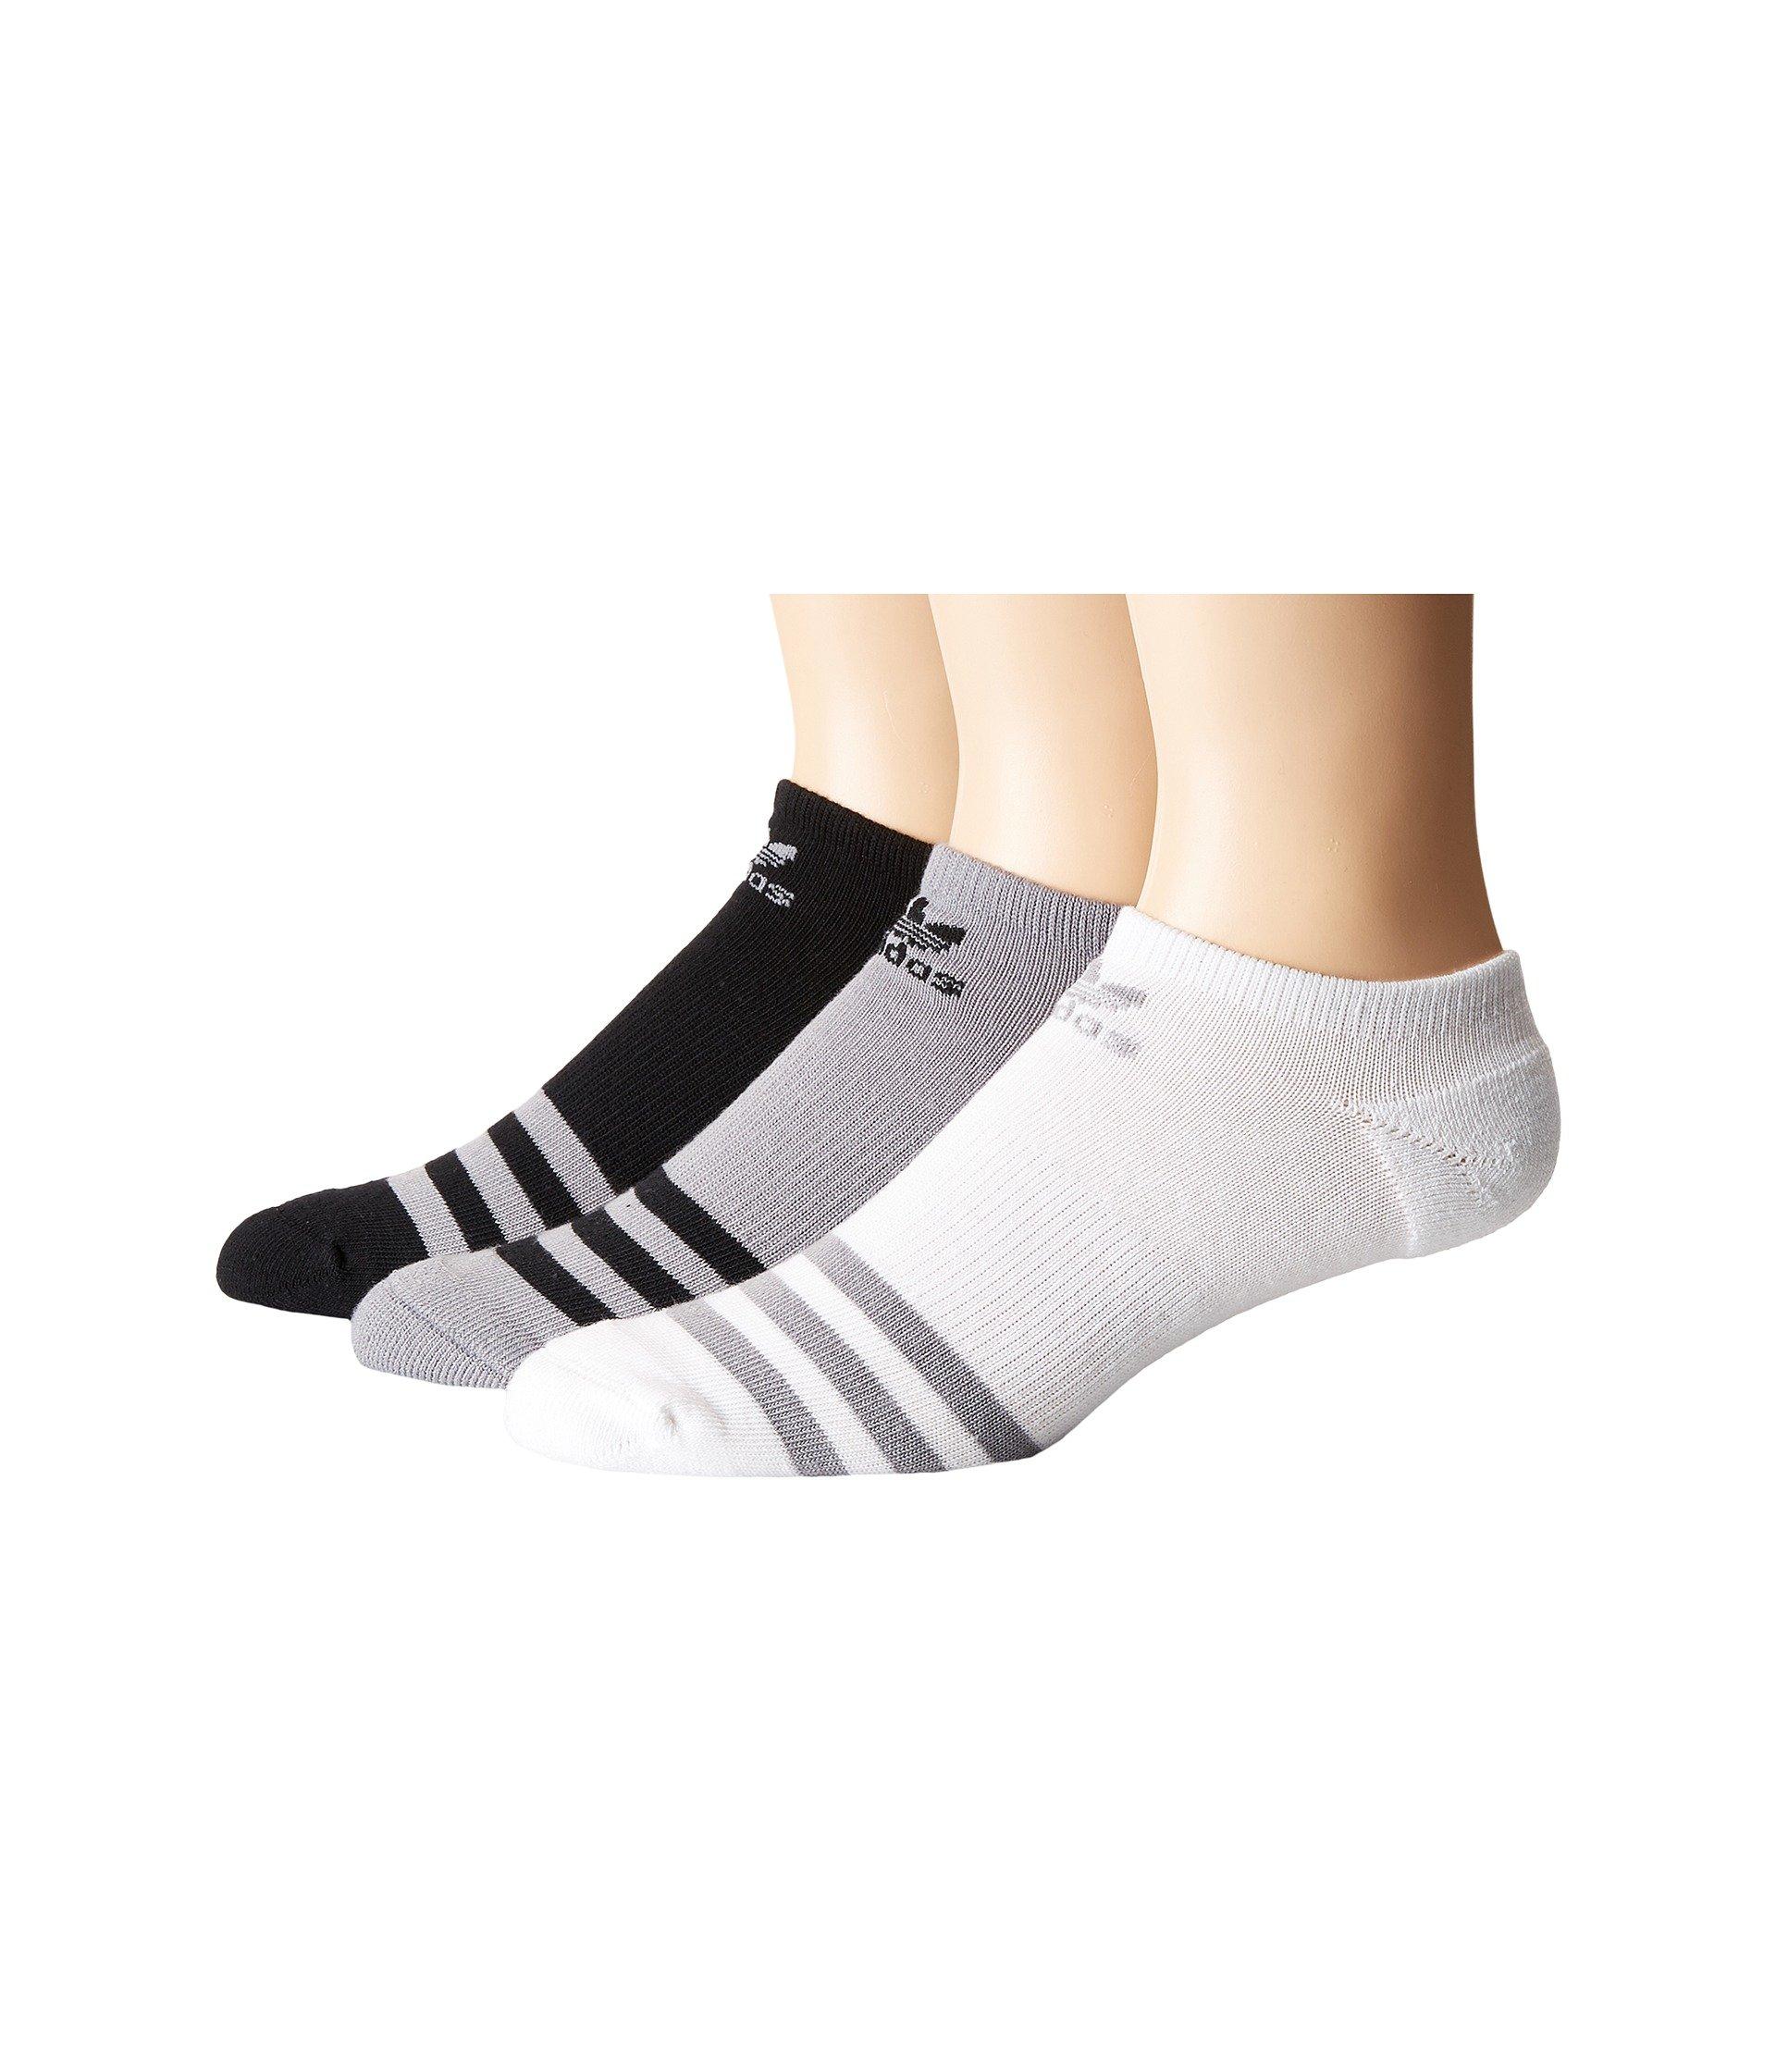 Adidas black Originals Show No 3 white Sock Roller Light Onix pack qqr4nz7p